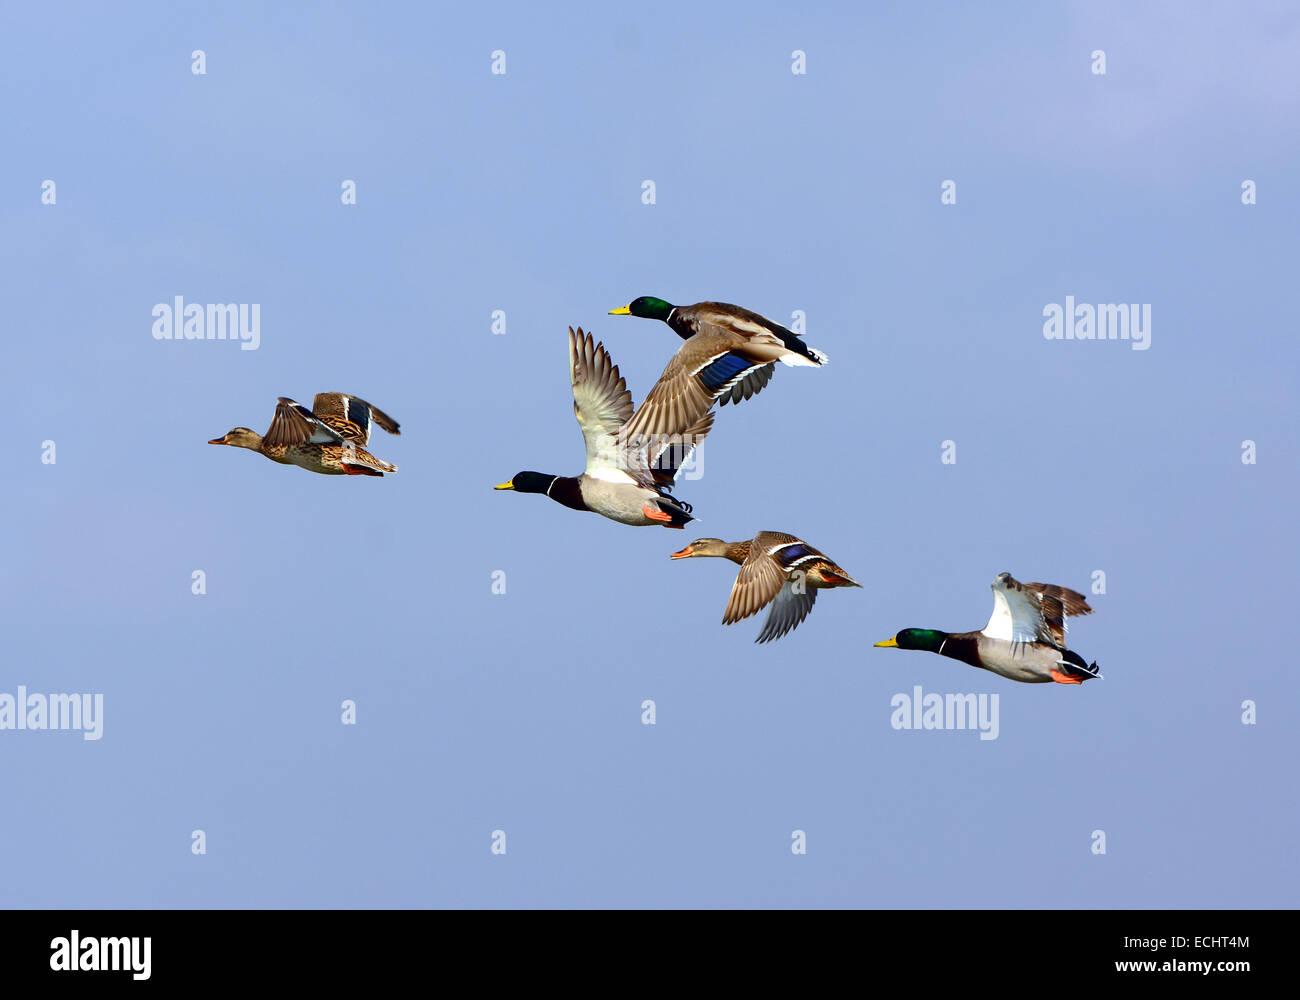 Mallard Duck, Anas platyrhynchos flying, - Stock Image